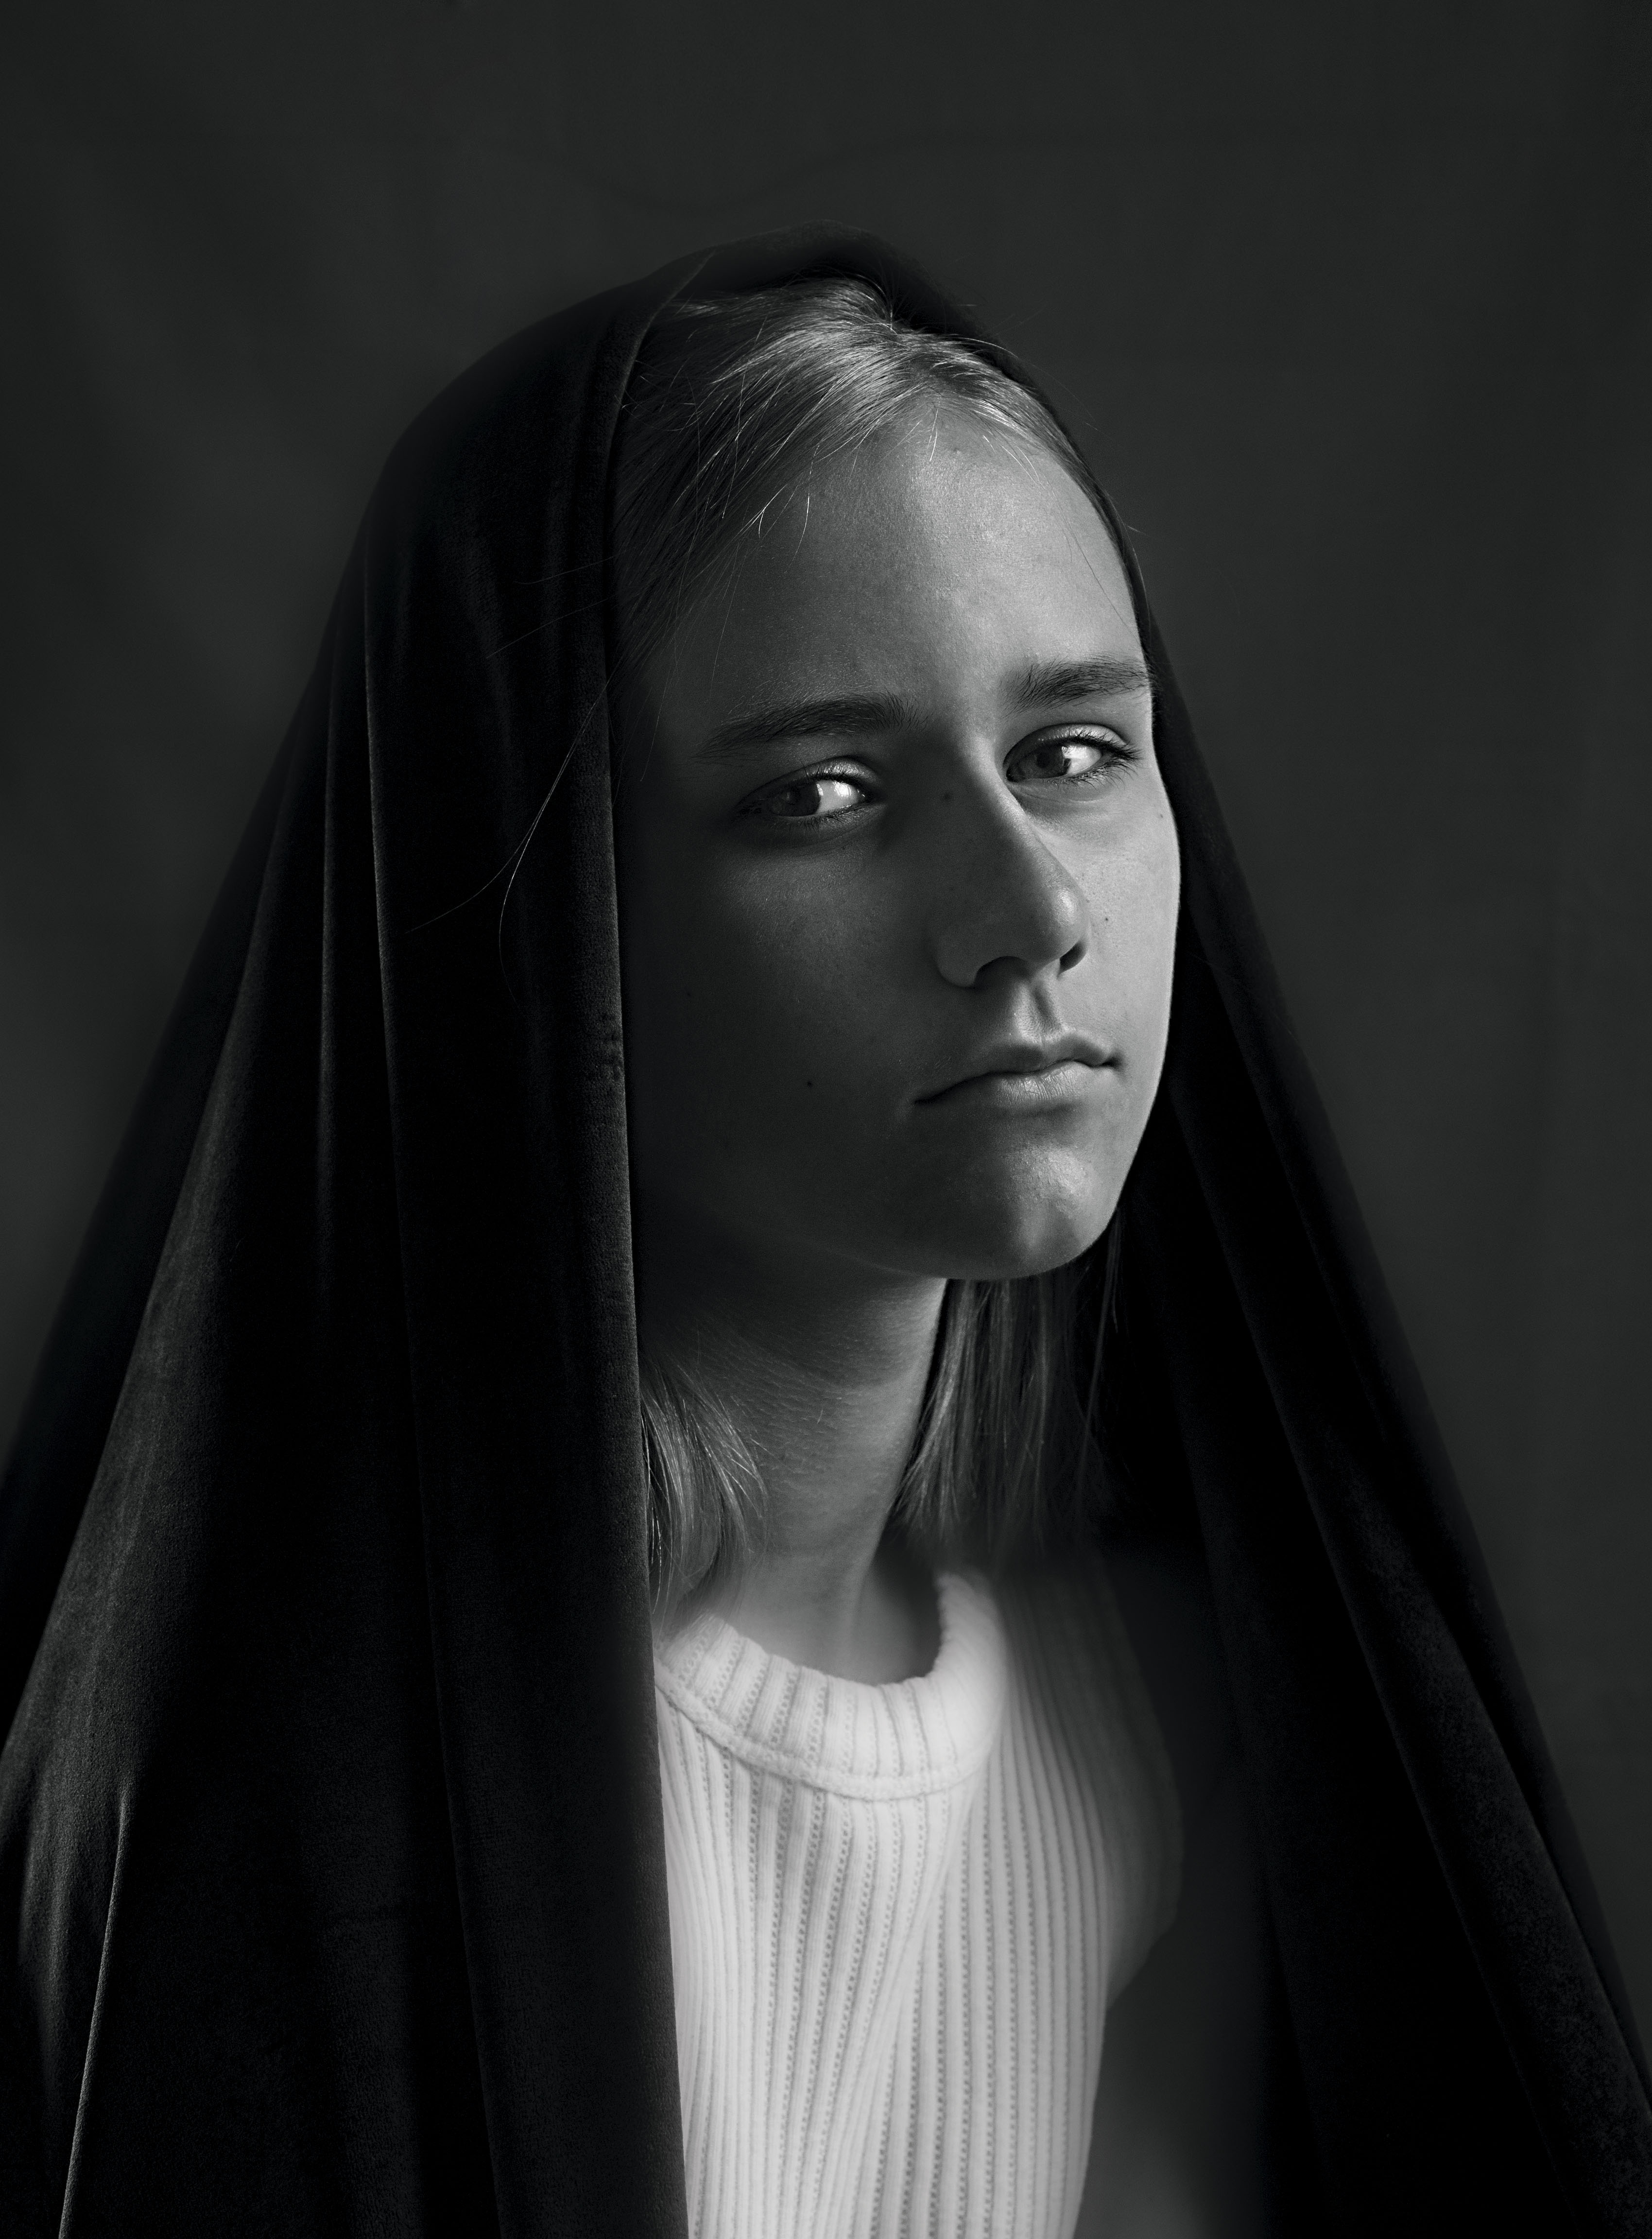 чб, чернобелыйпортрет, portrait, портрет, bnw, анна шацкая